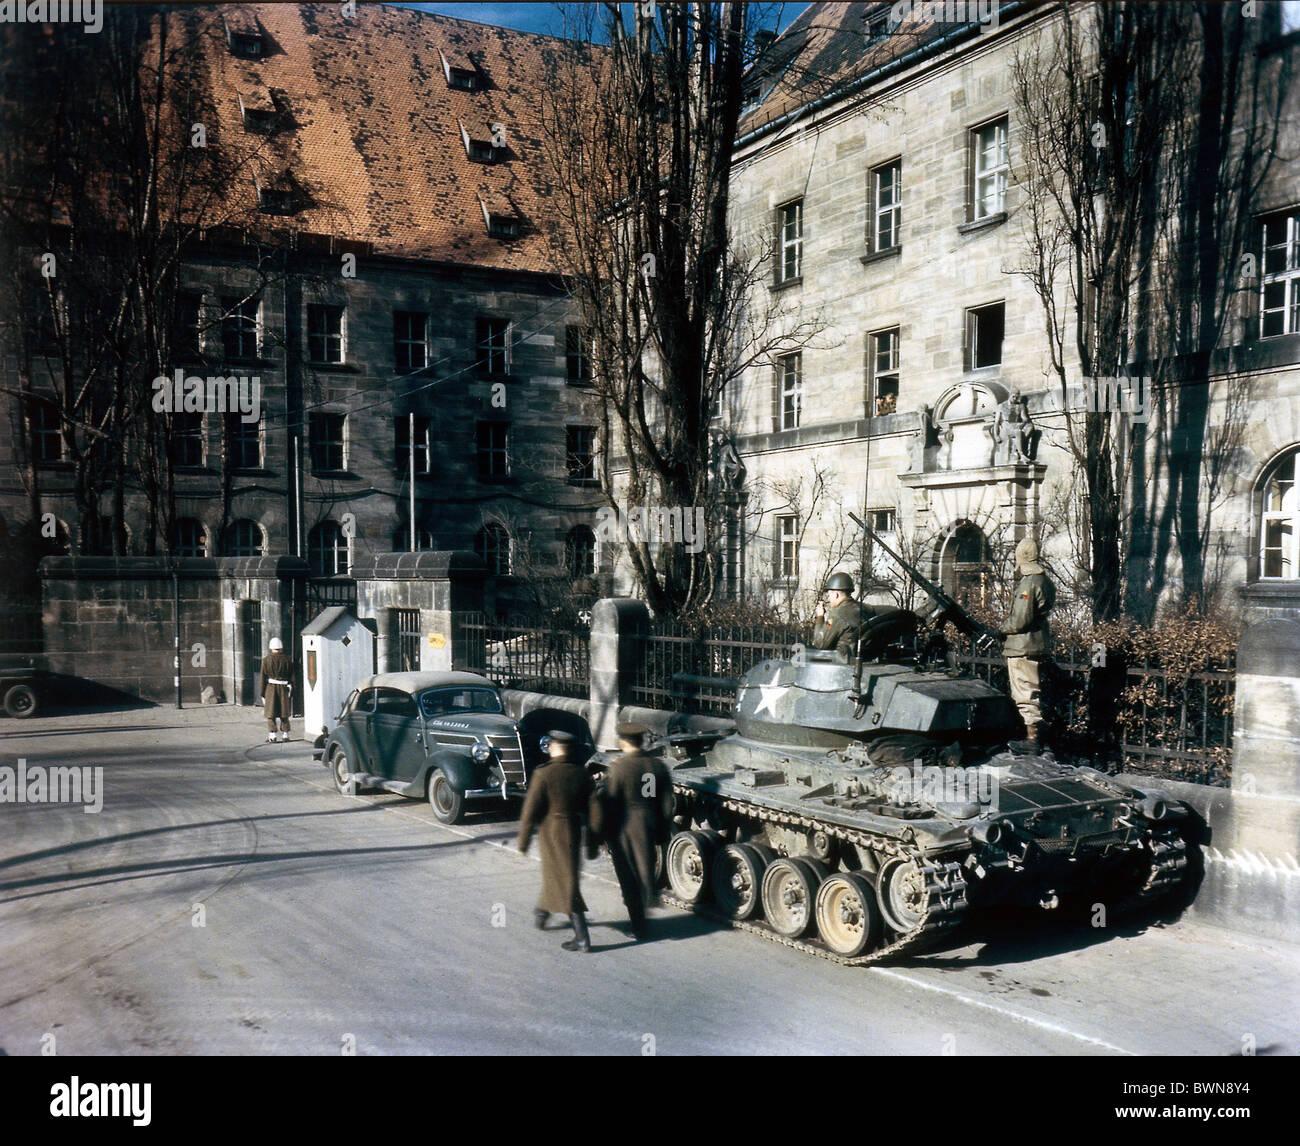 Nuremberg 1946 International Military Tribunal October 1 Court House International War Crimes Trial US tank Ge - Stock Image